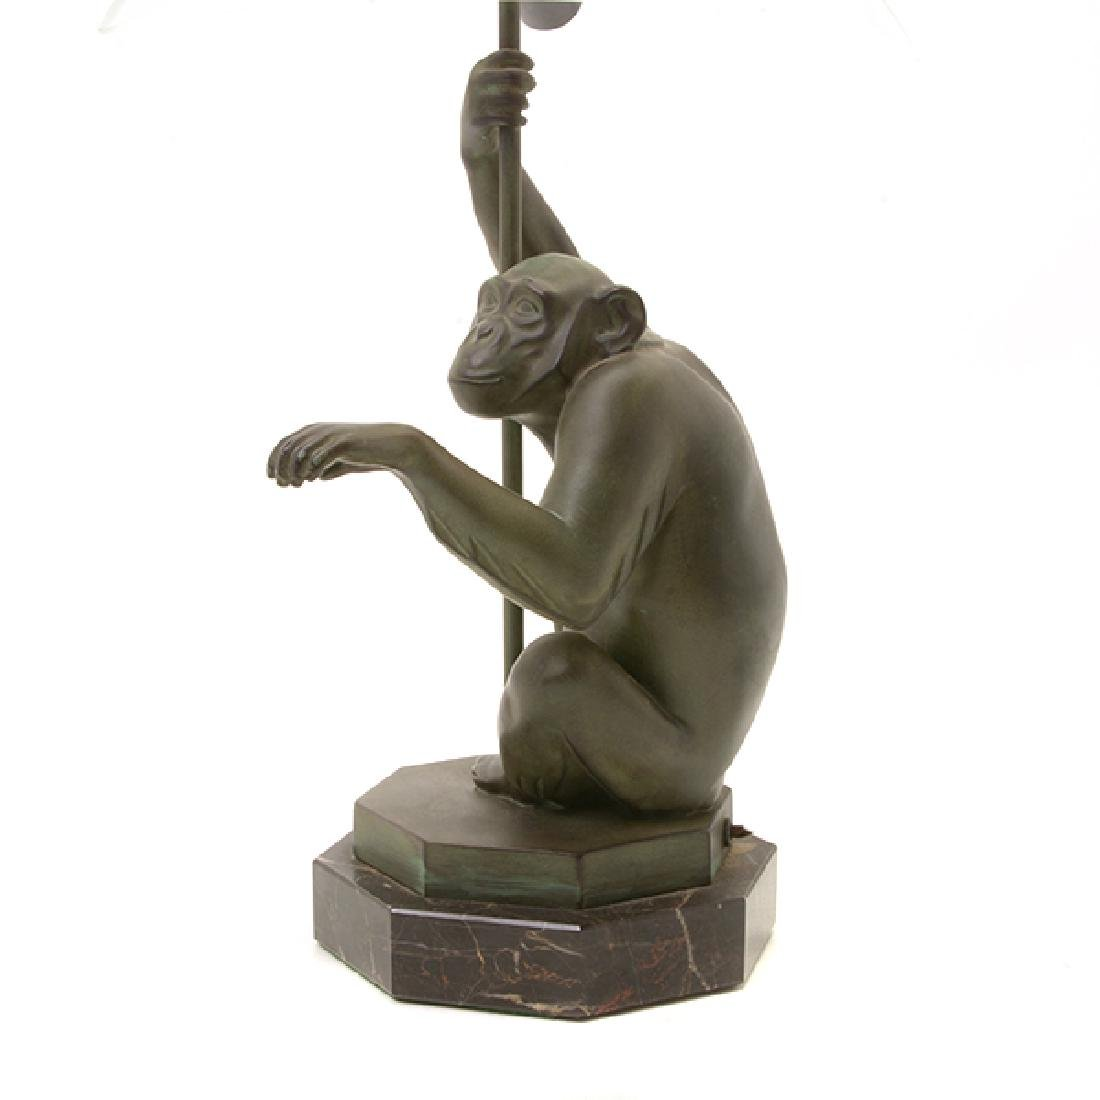 Bronze Monkey Figural Lamp with Glass Umbrella Form - 4